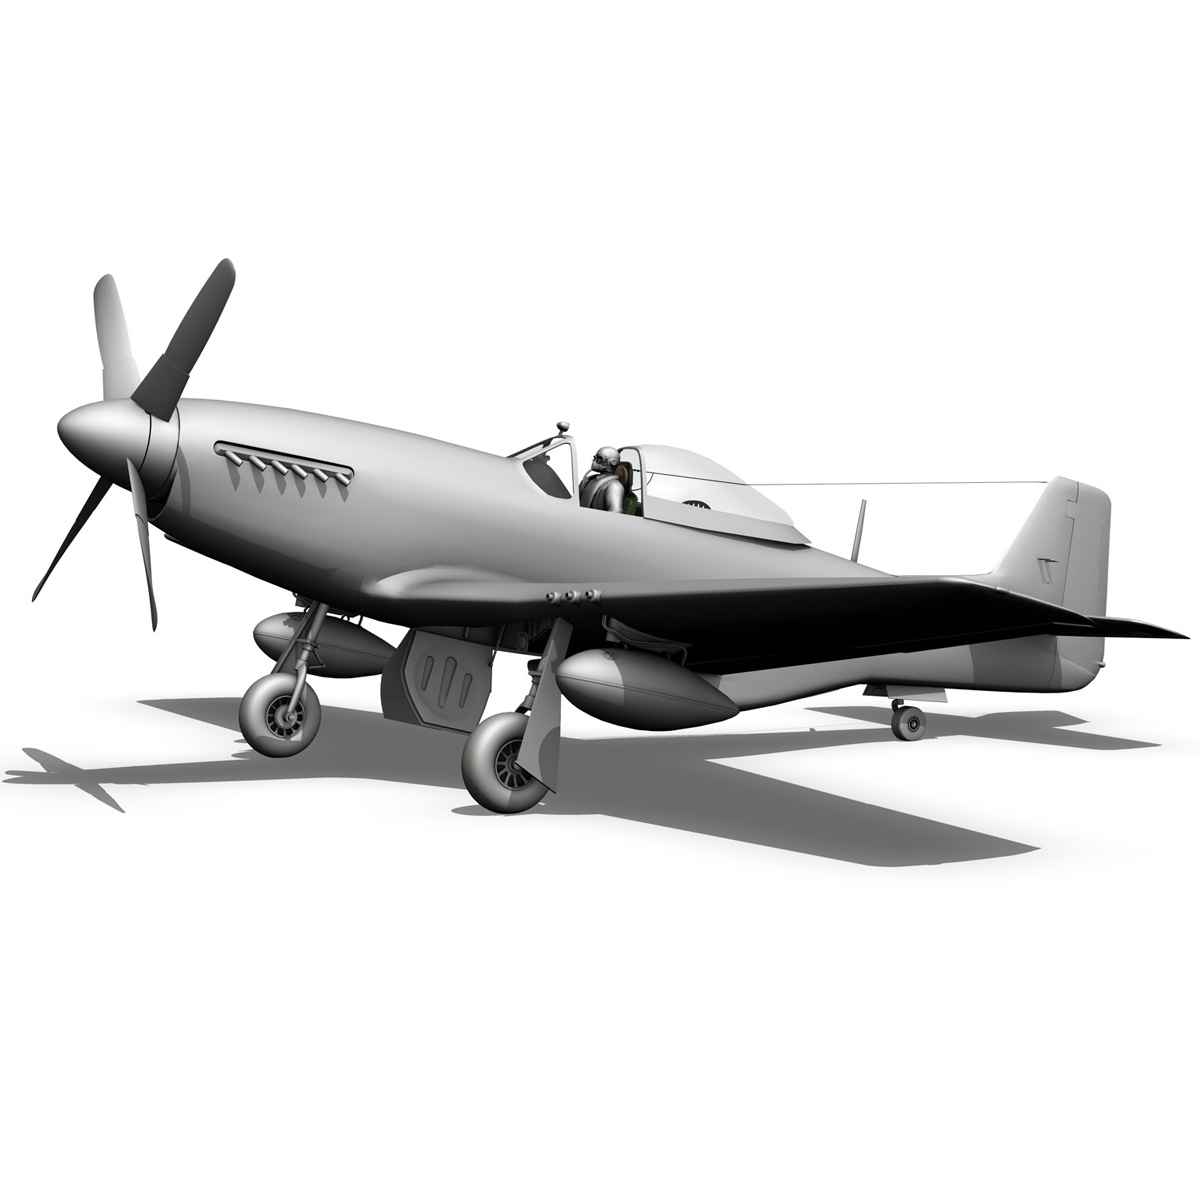 north american p-51k mustang mk.iv – raf 3d model fbx c4d lwo obj 280353